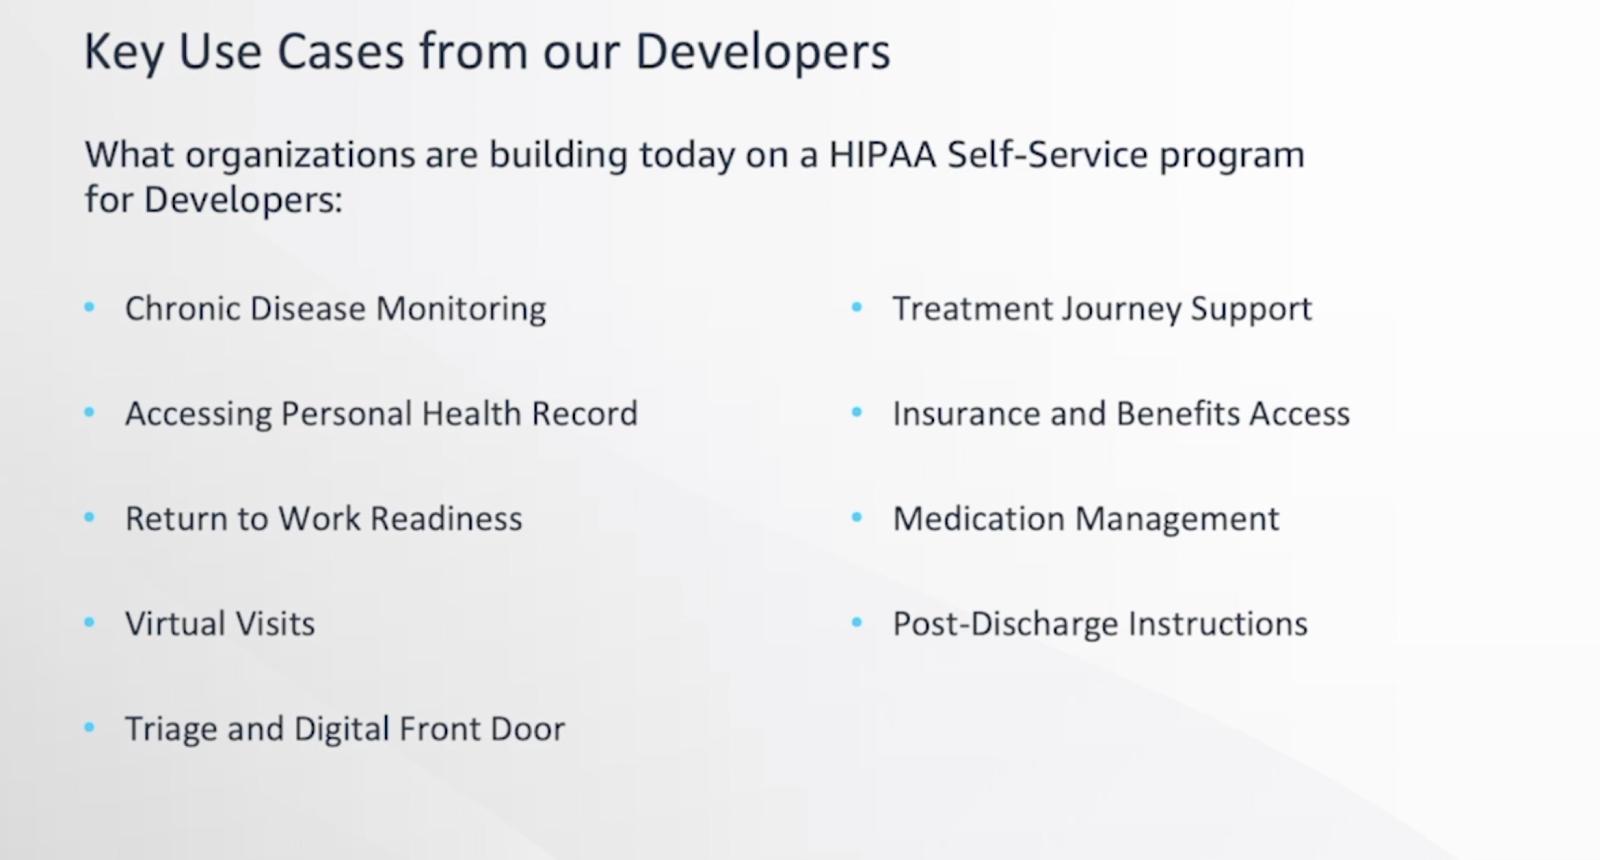 From Head of Alexa Health Rachel Jiang HLTH2020 presentation